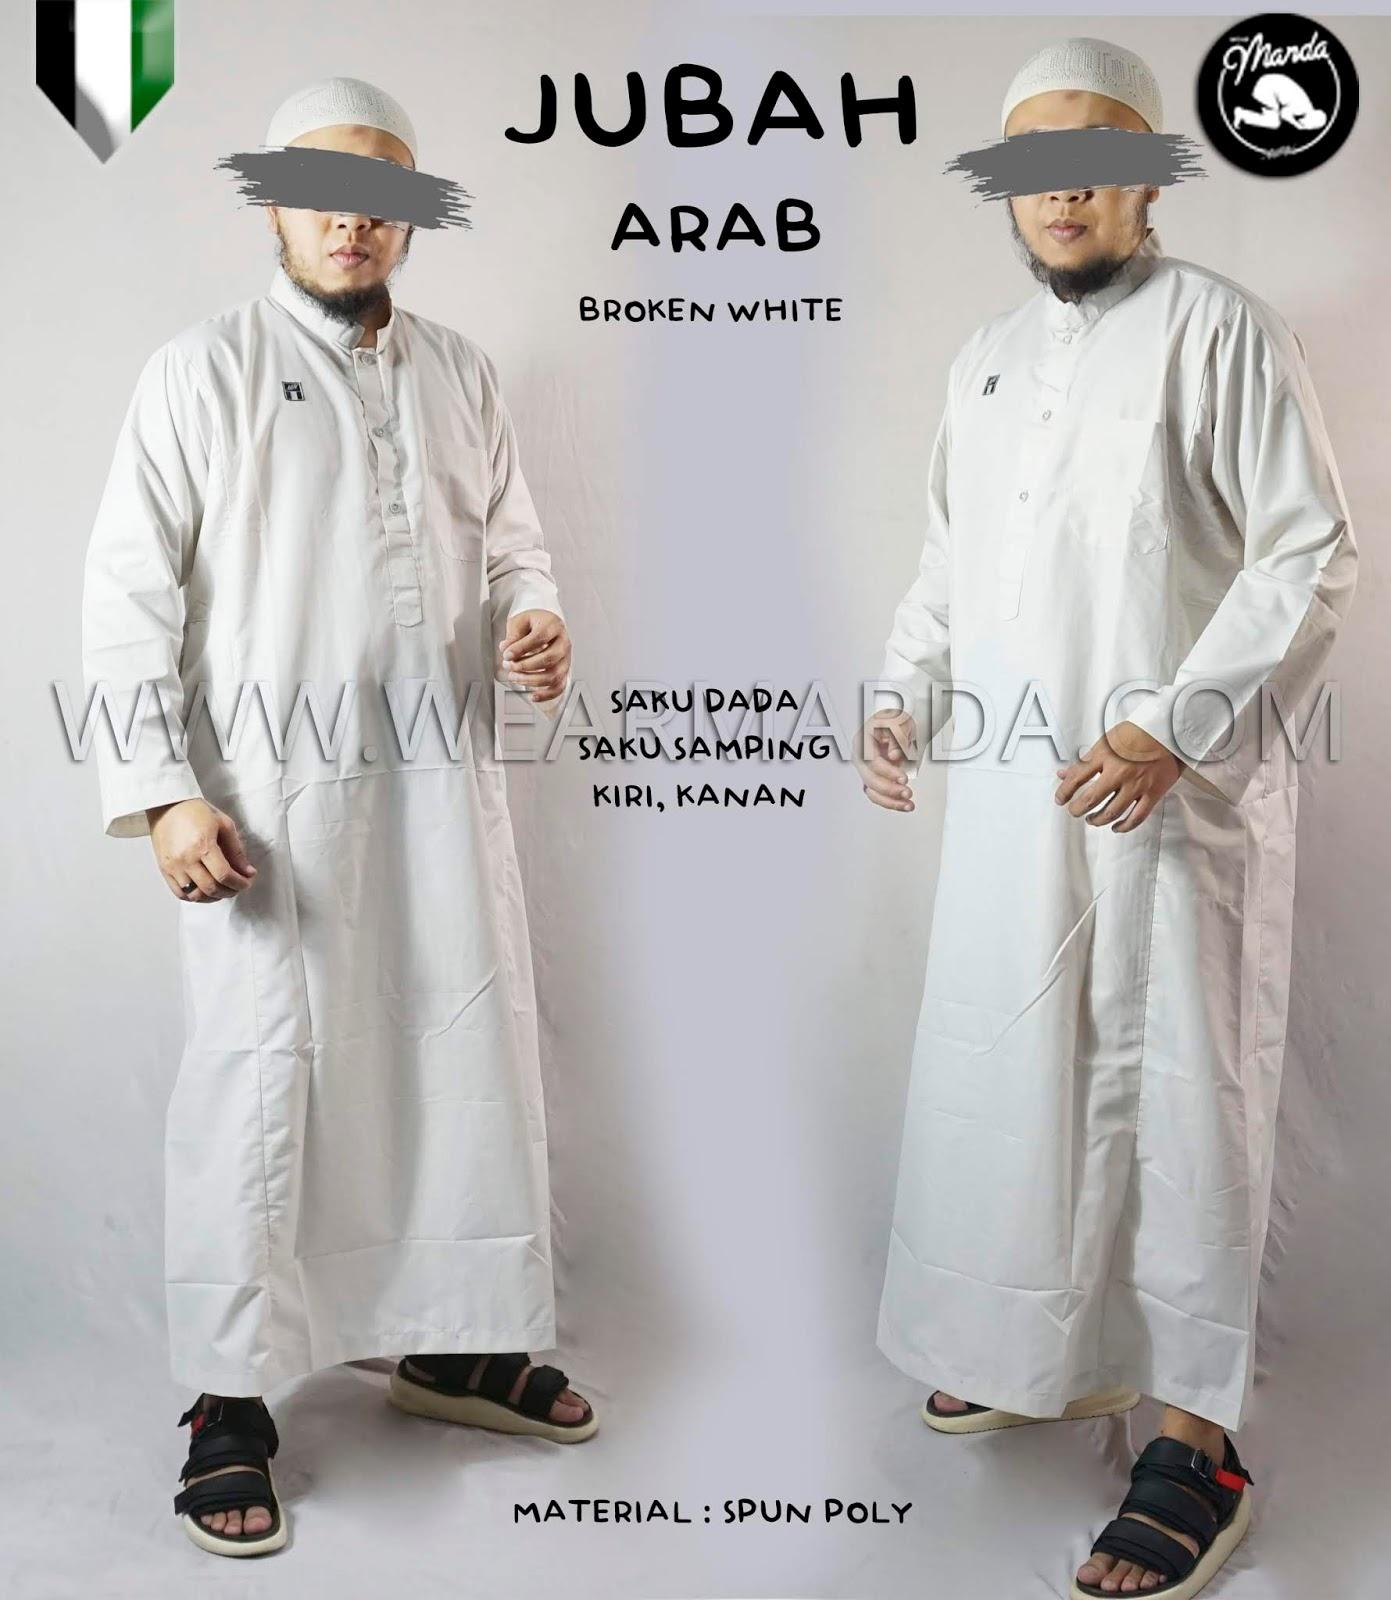 JUBAH ARAB BROKEN WHITE